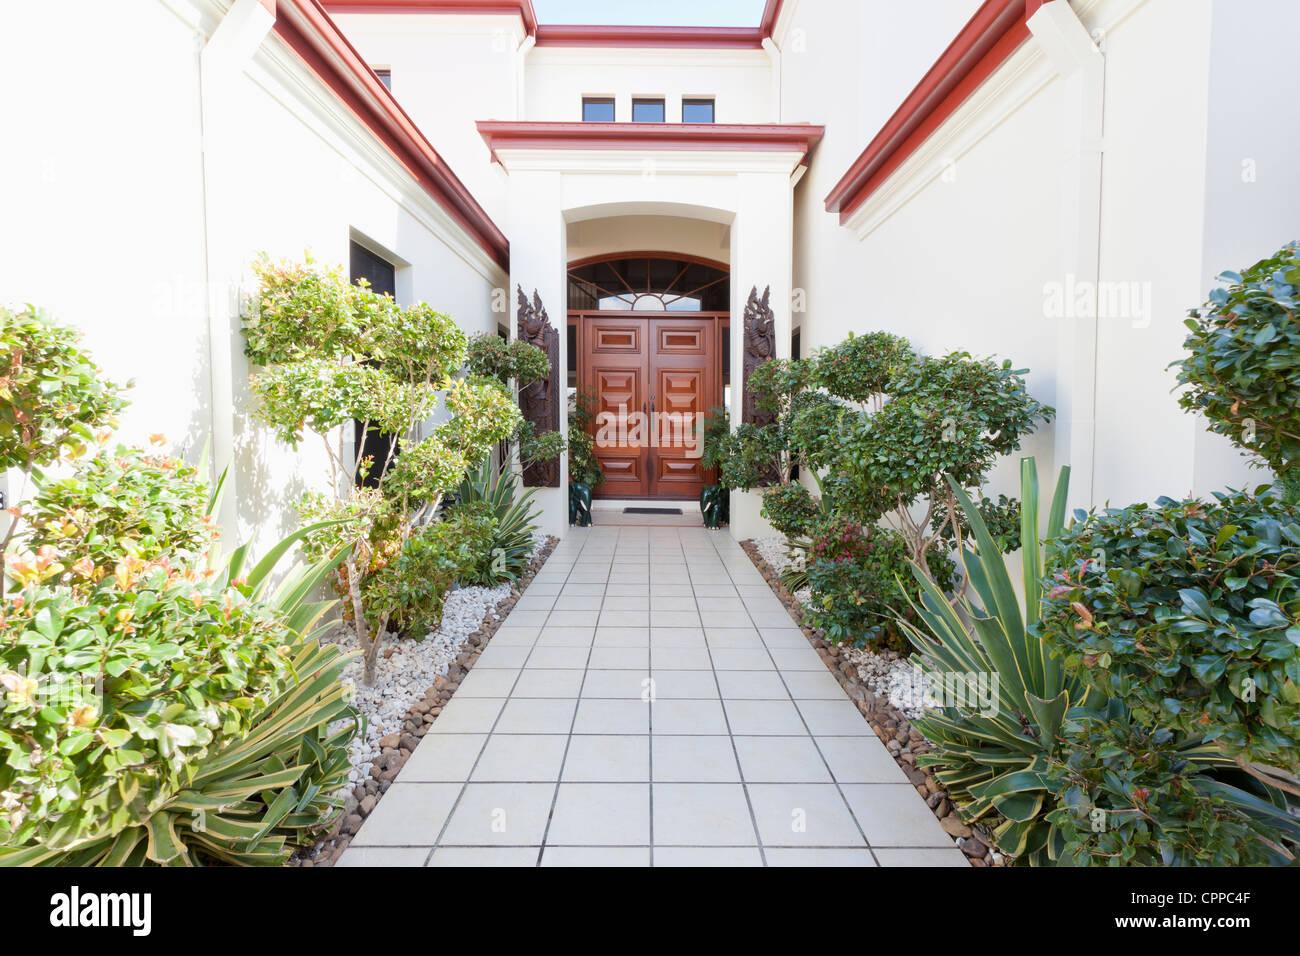 Eingang zur Luxusvilla Stockbild